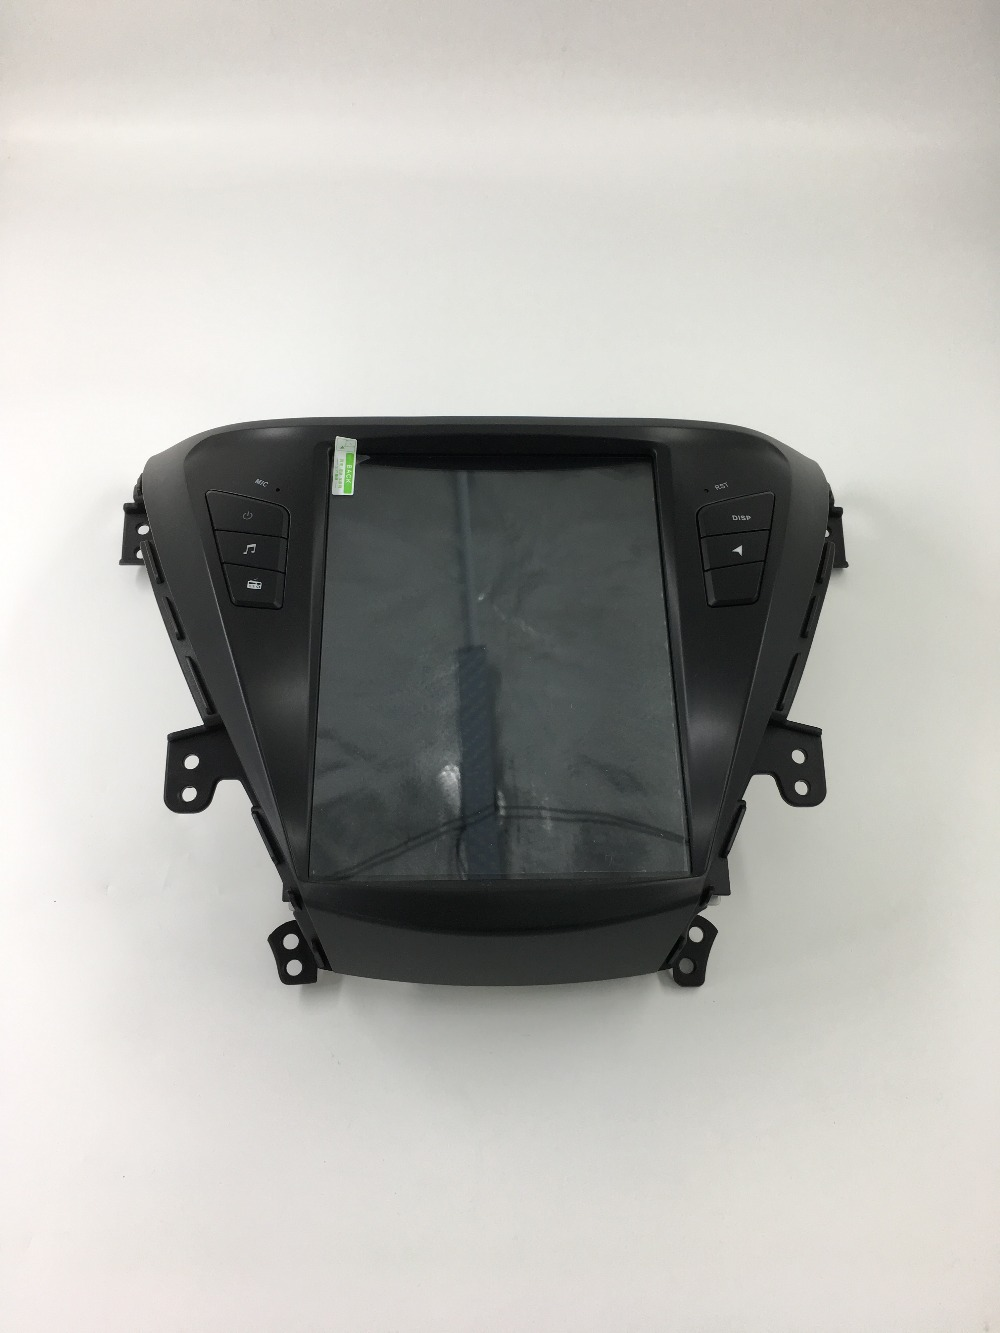 Autocardvdgps d618b15baa � 10.4'' vertical big screen tesla style android ram 2g rom 32g  auto car dvd gps player